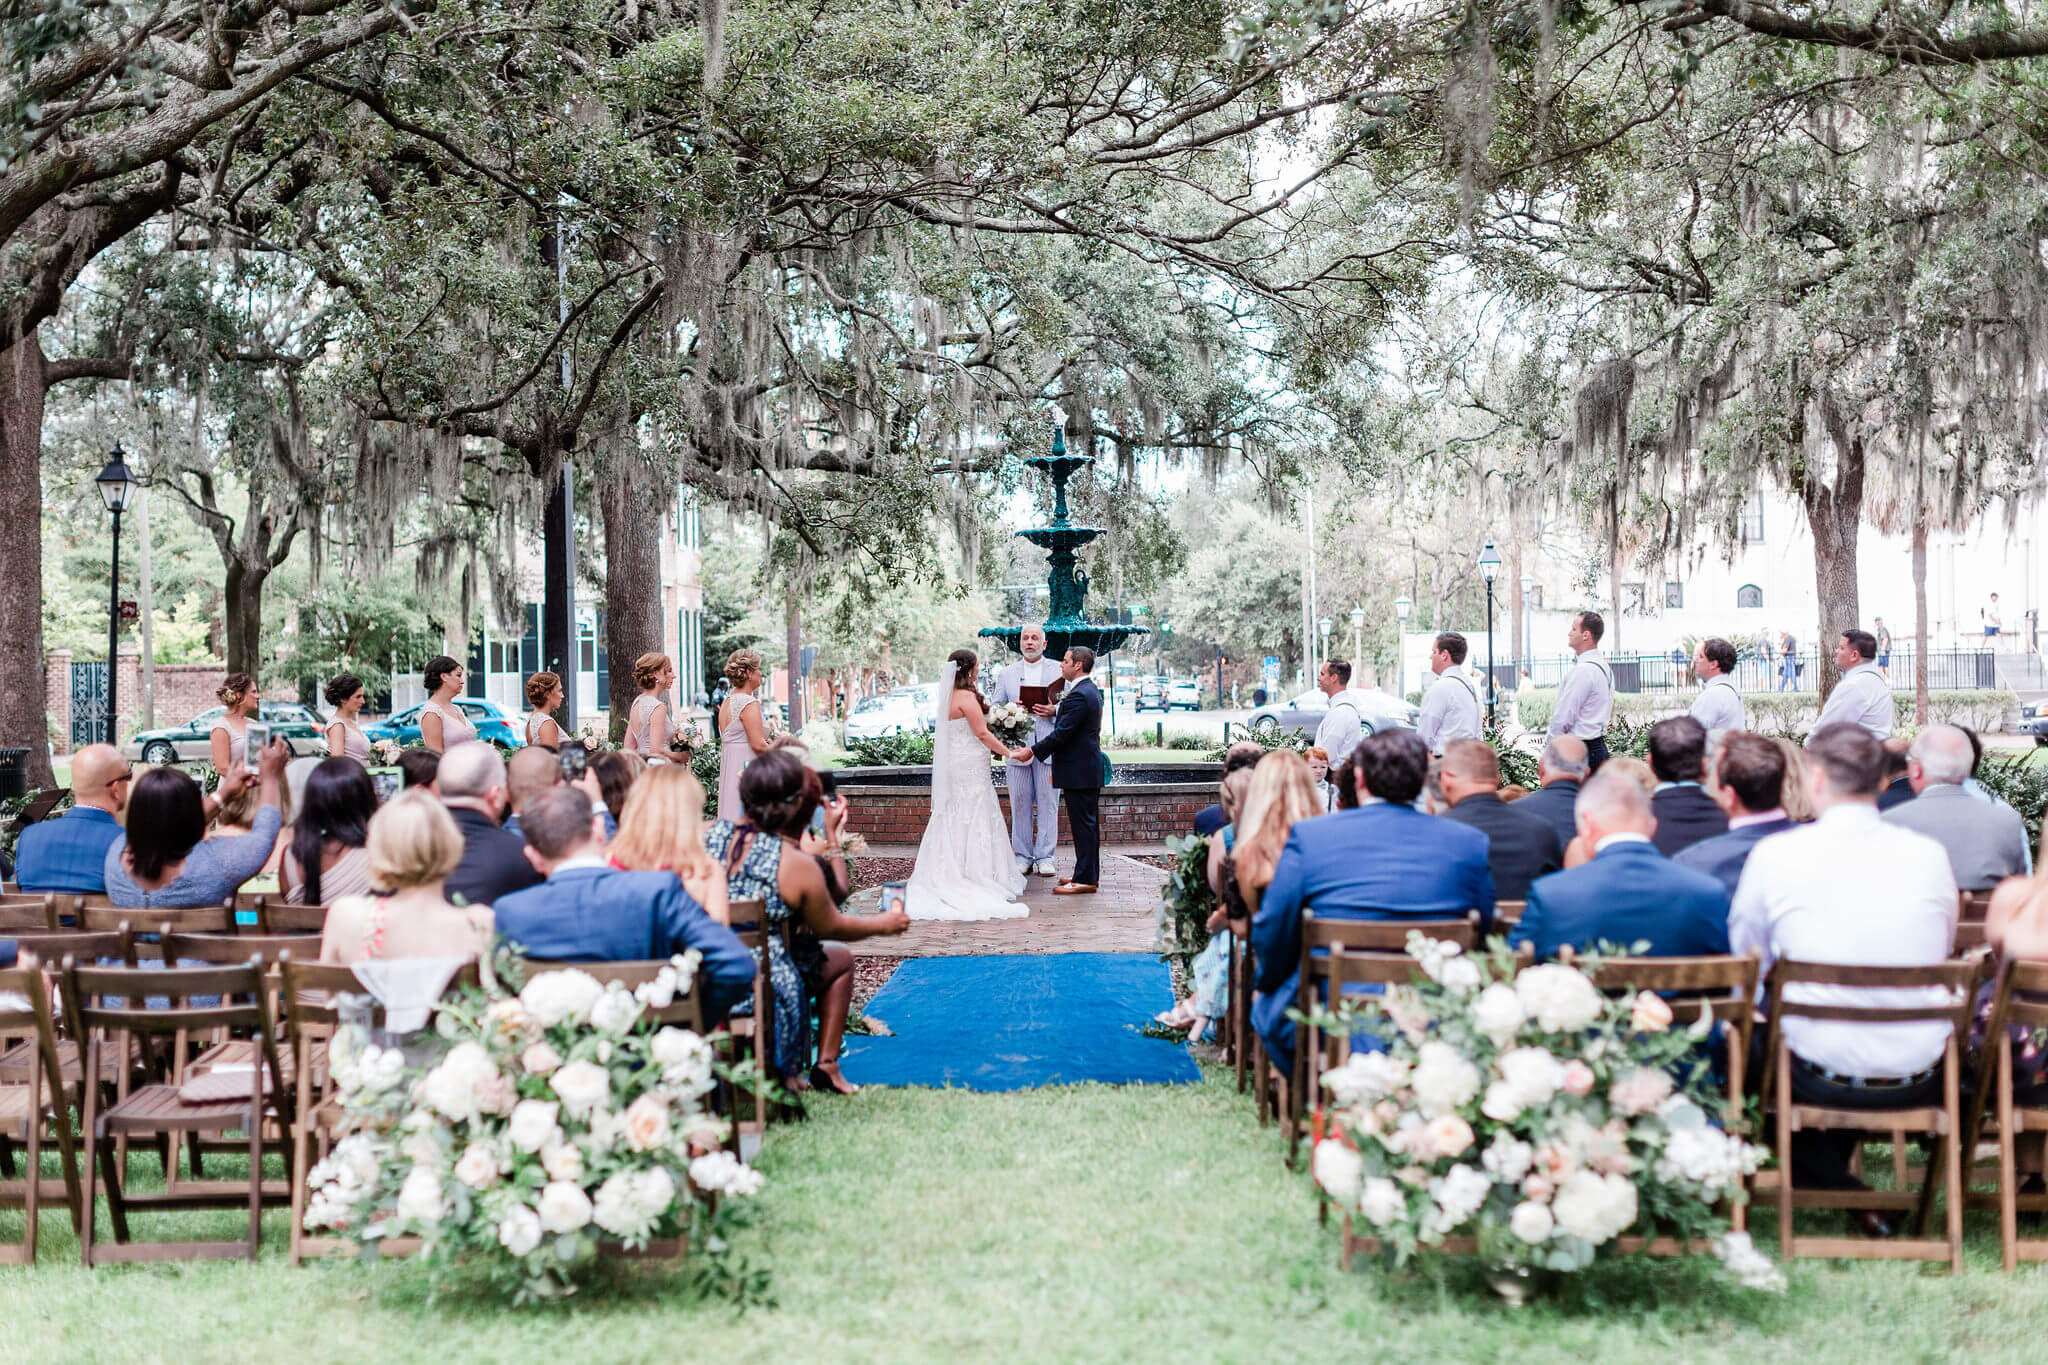 apt-b-photography-savannah-wedding-photographer-savannah-wedding-savannah-elopement-intimate-wedding-photographer-7.jpg